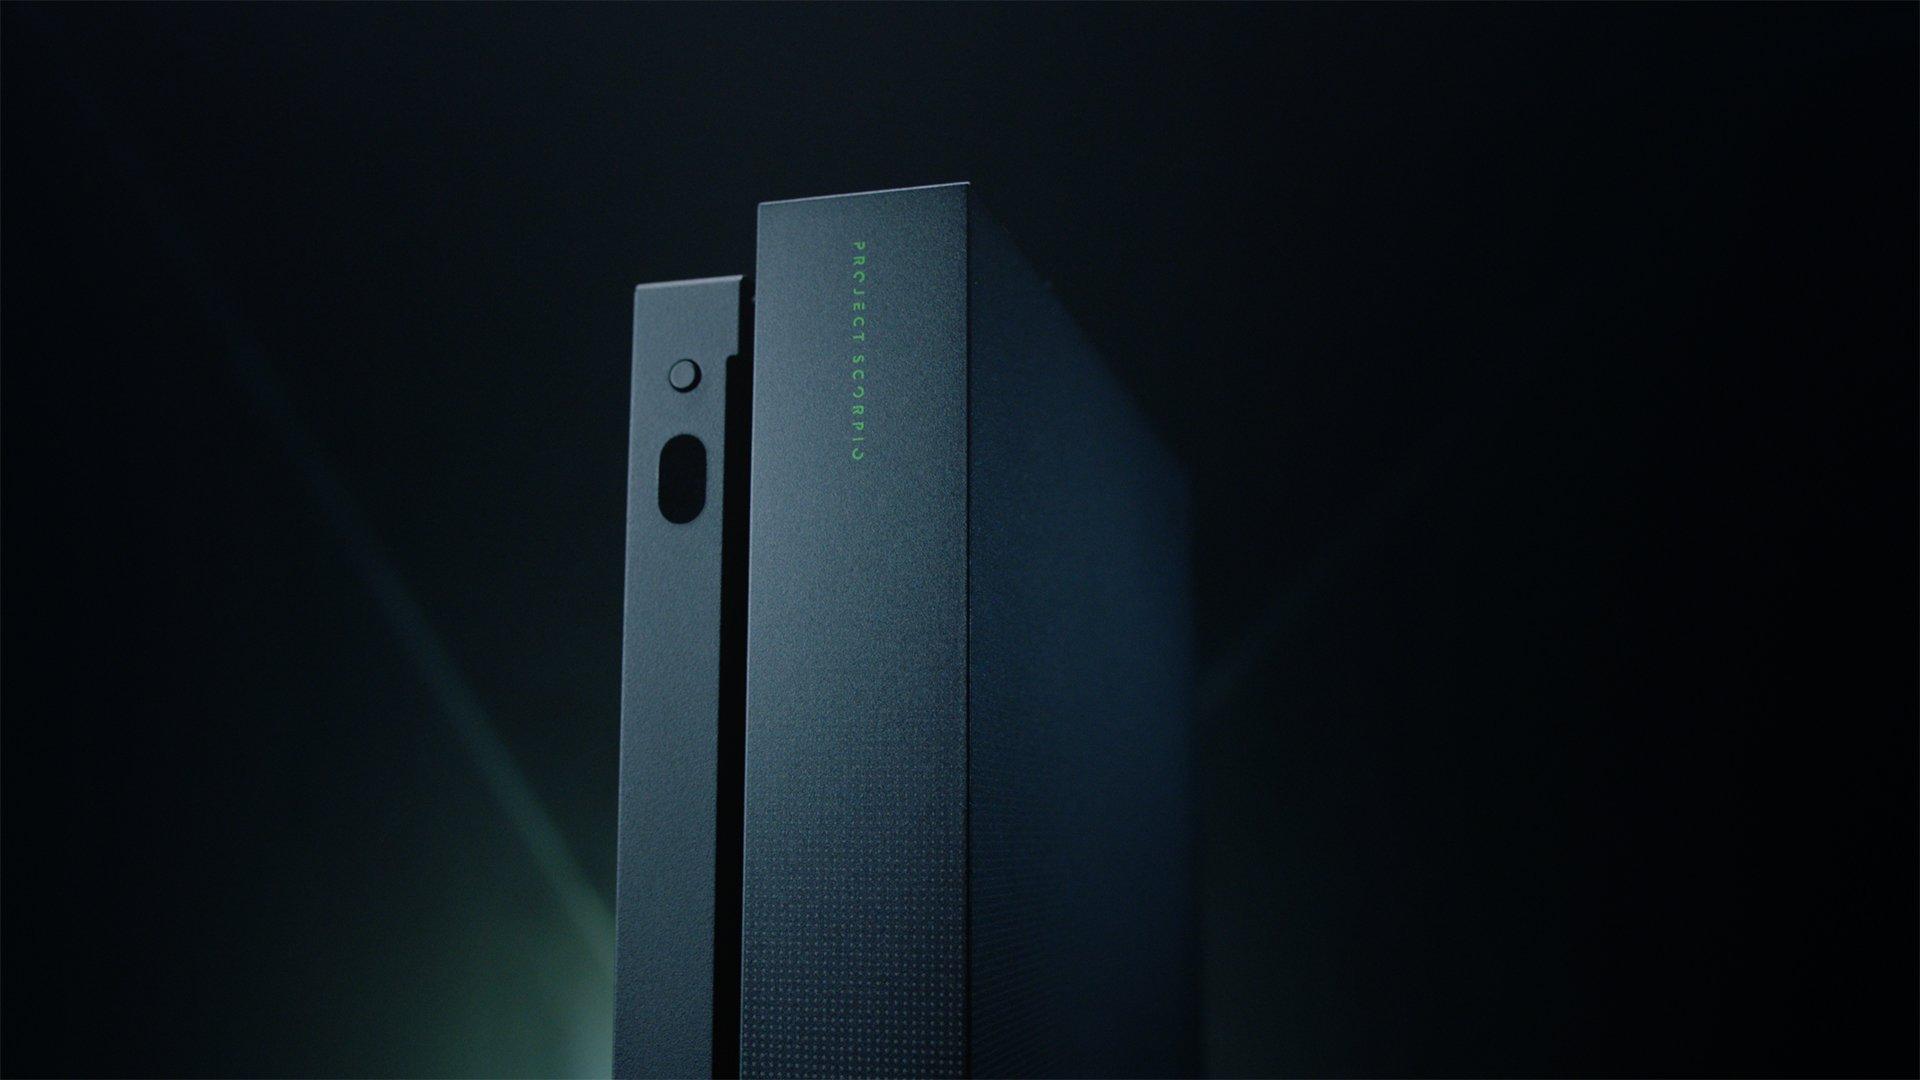 Introducing the exclusive #XboxOneX Project Scorpio Edition. https://t.co/IZ41q4Mtwm #XboxGC https://t.co/gL4lqh9jfi